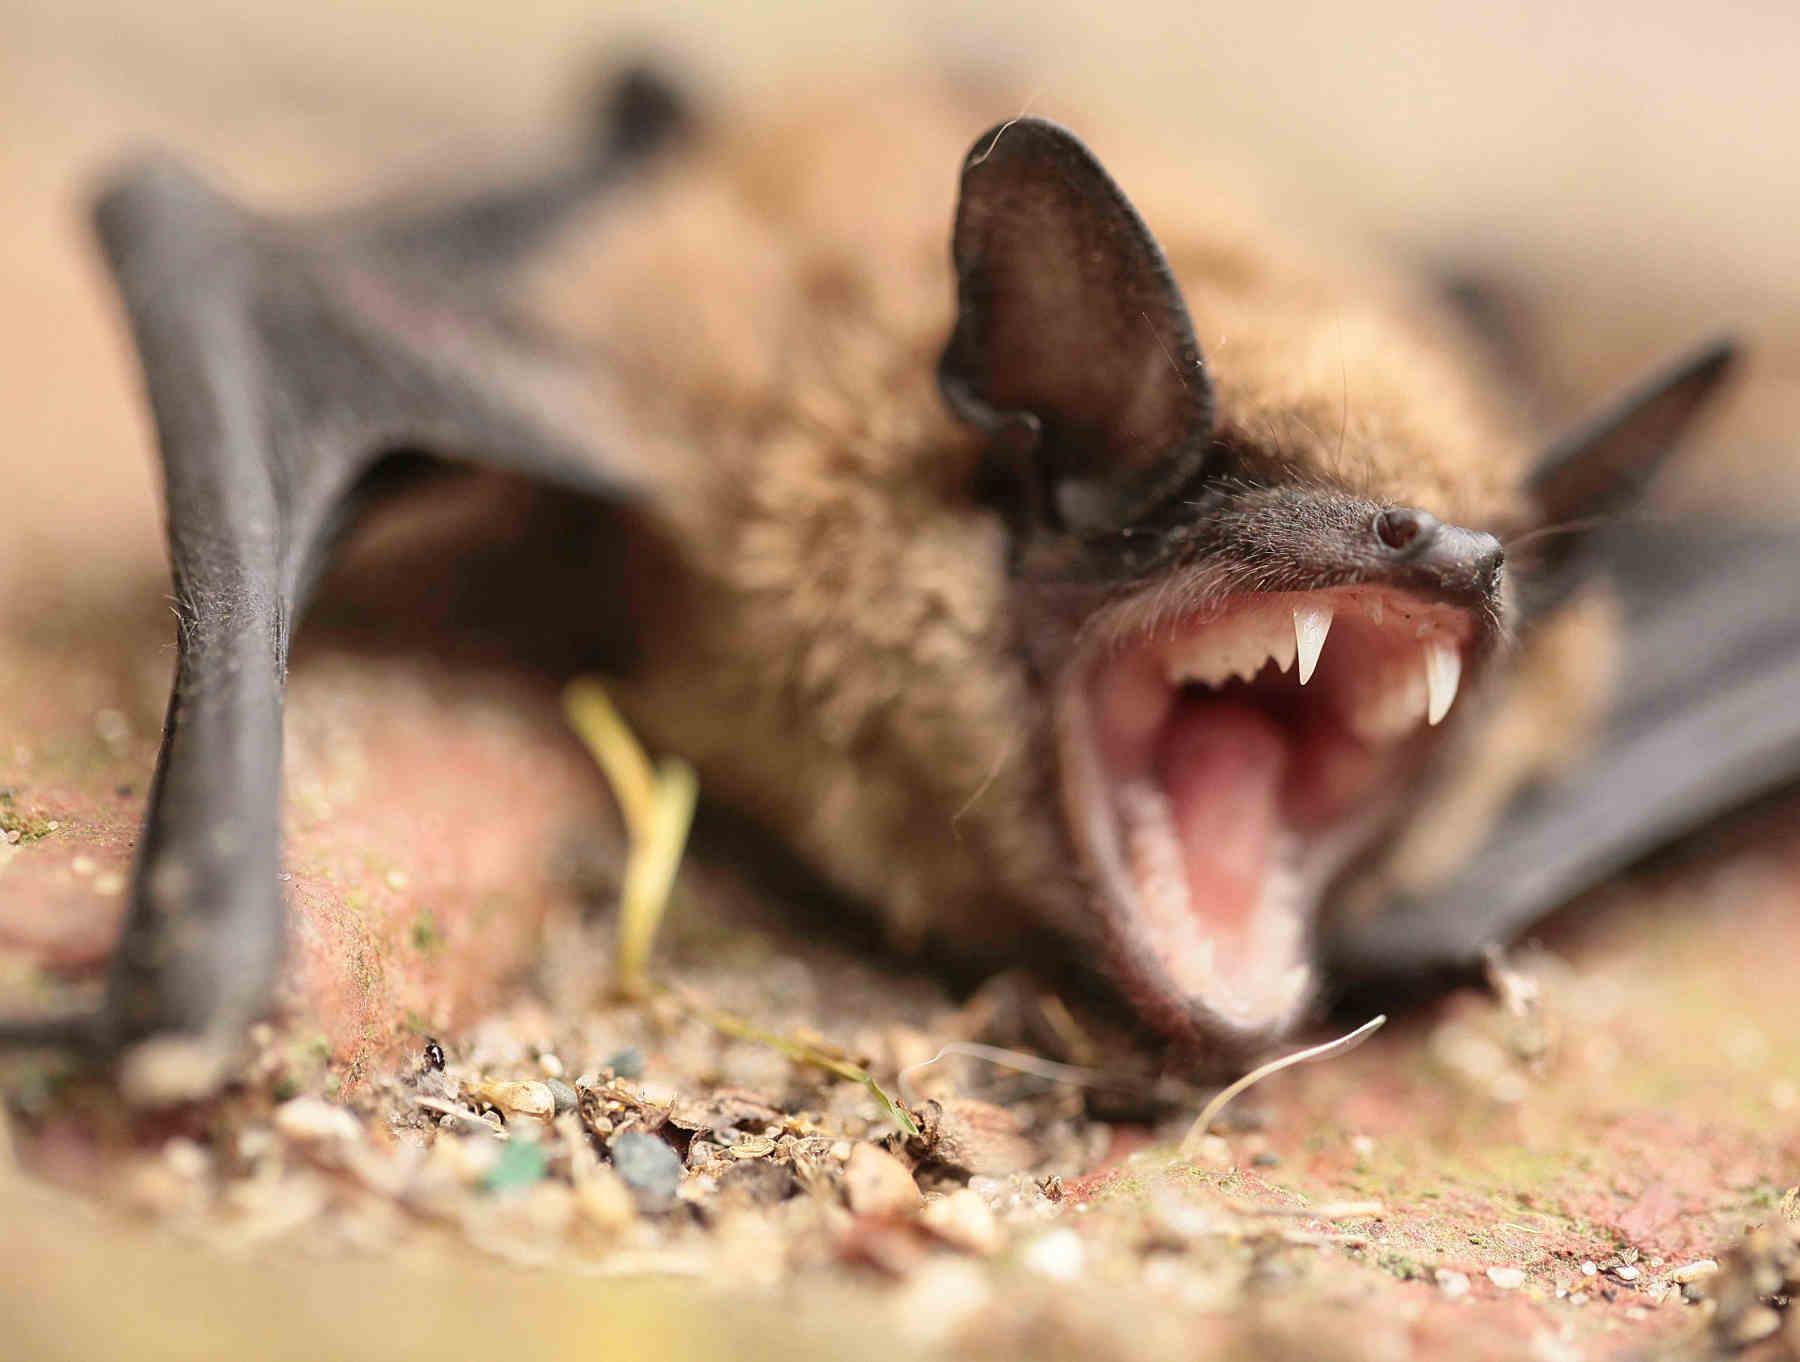 Georgetown Bat Removal